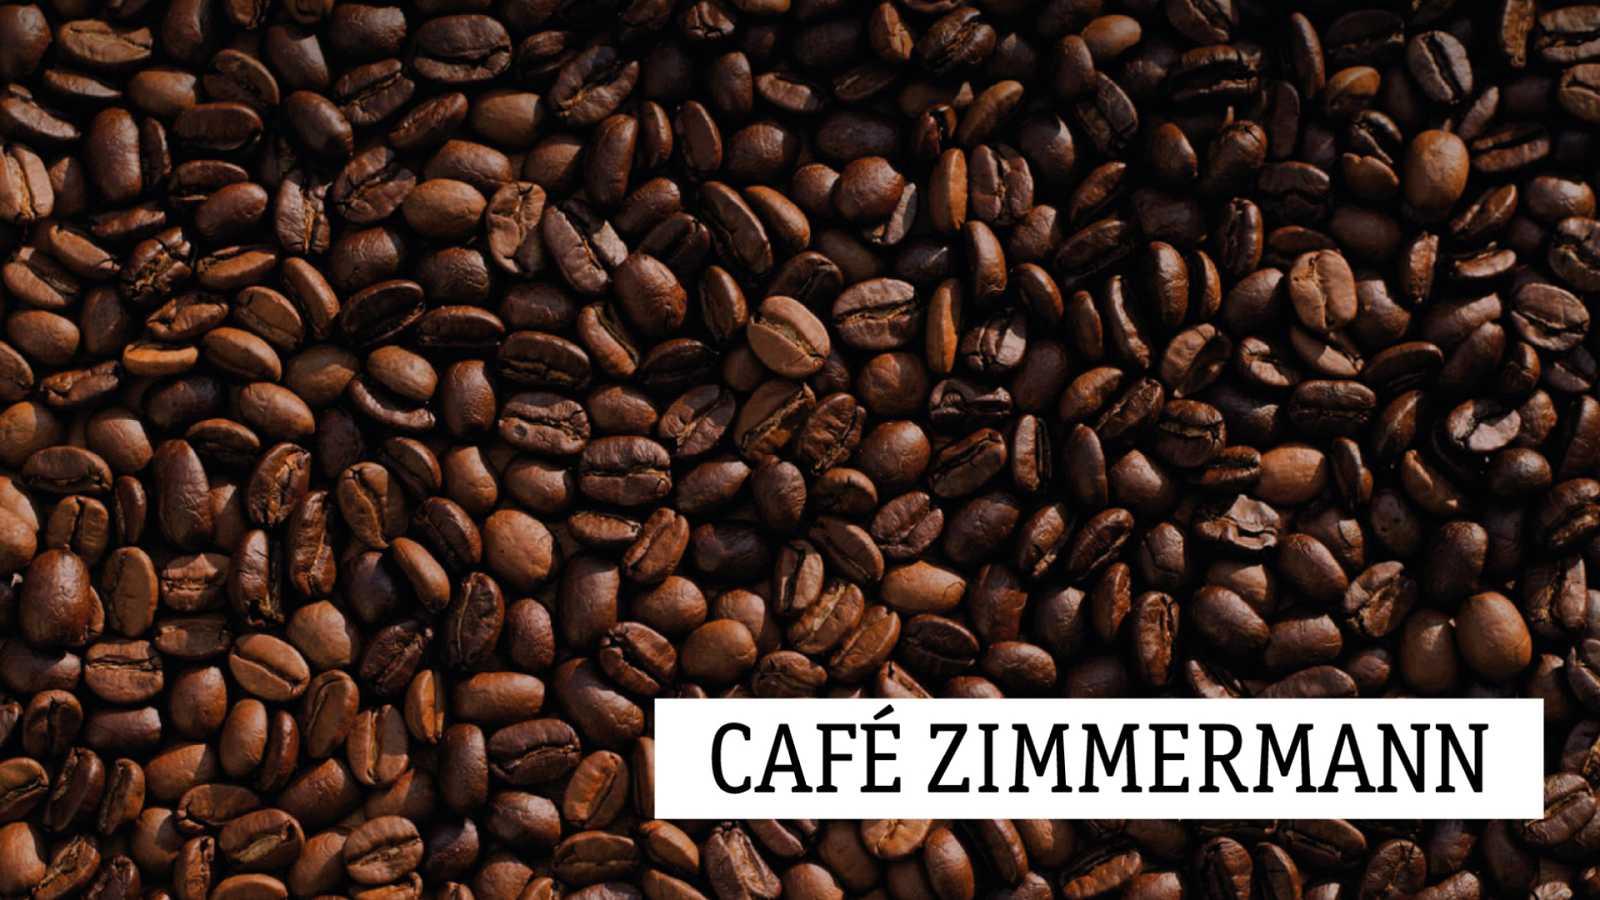 Café Zimmermann - Historia oculta de la música - 20/01/21 - escuchar ahora